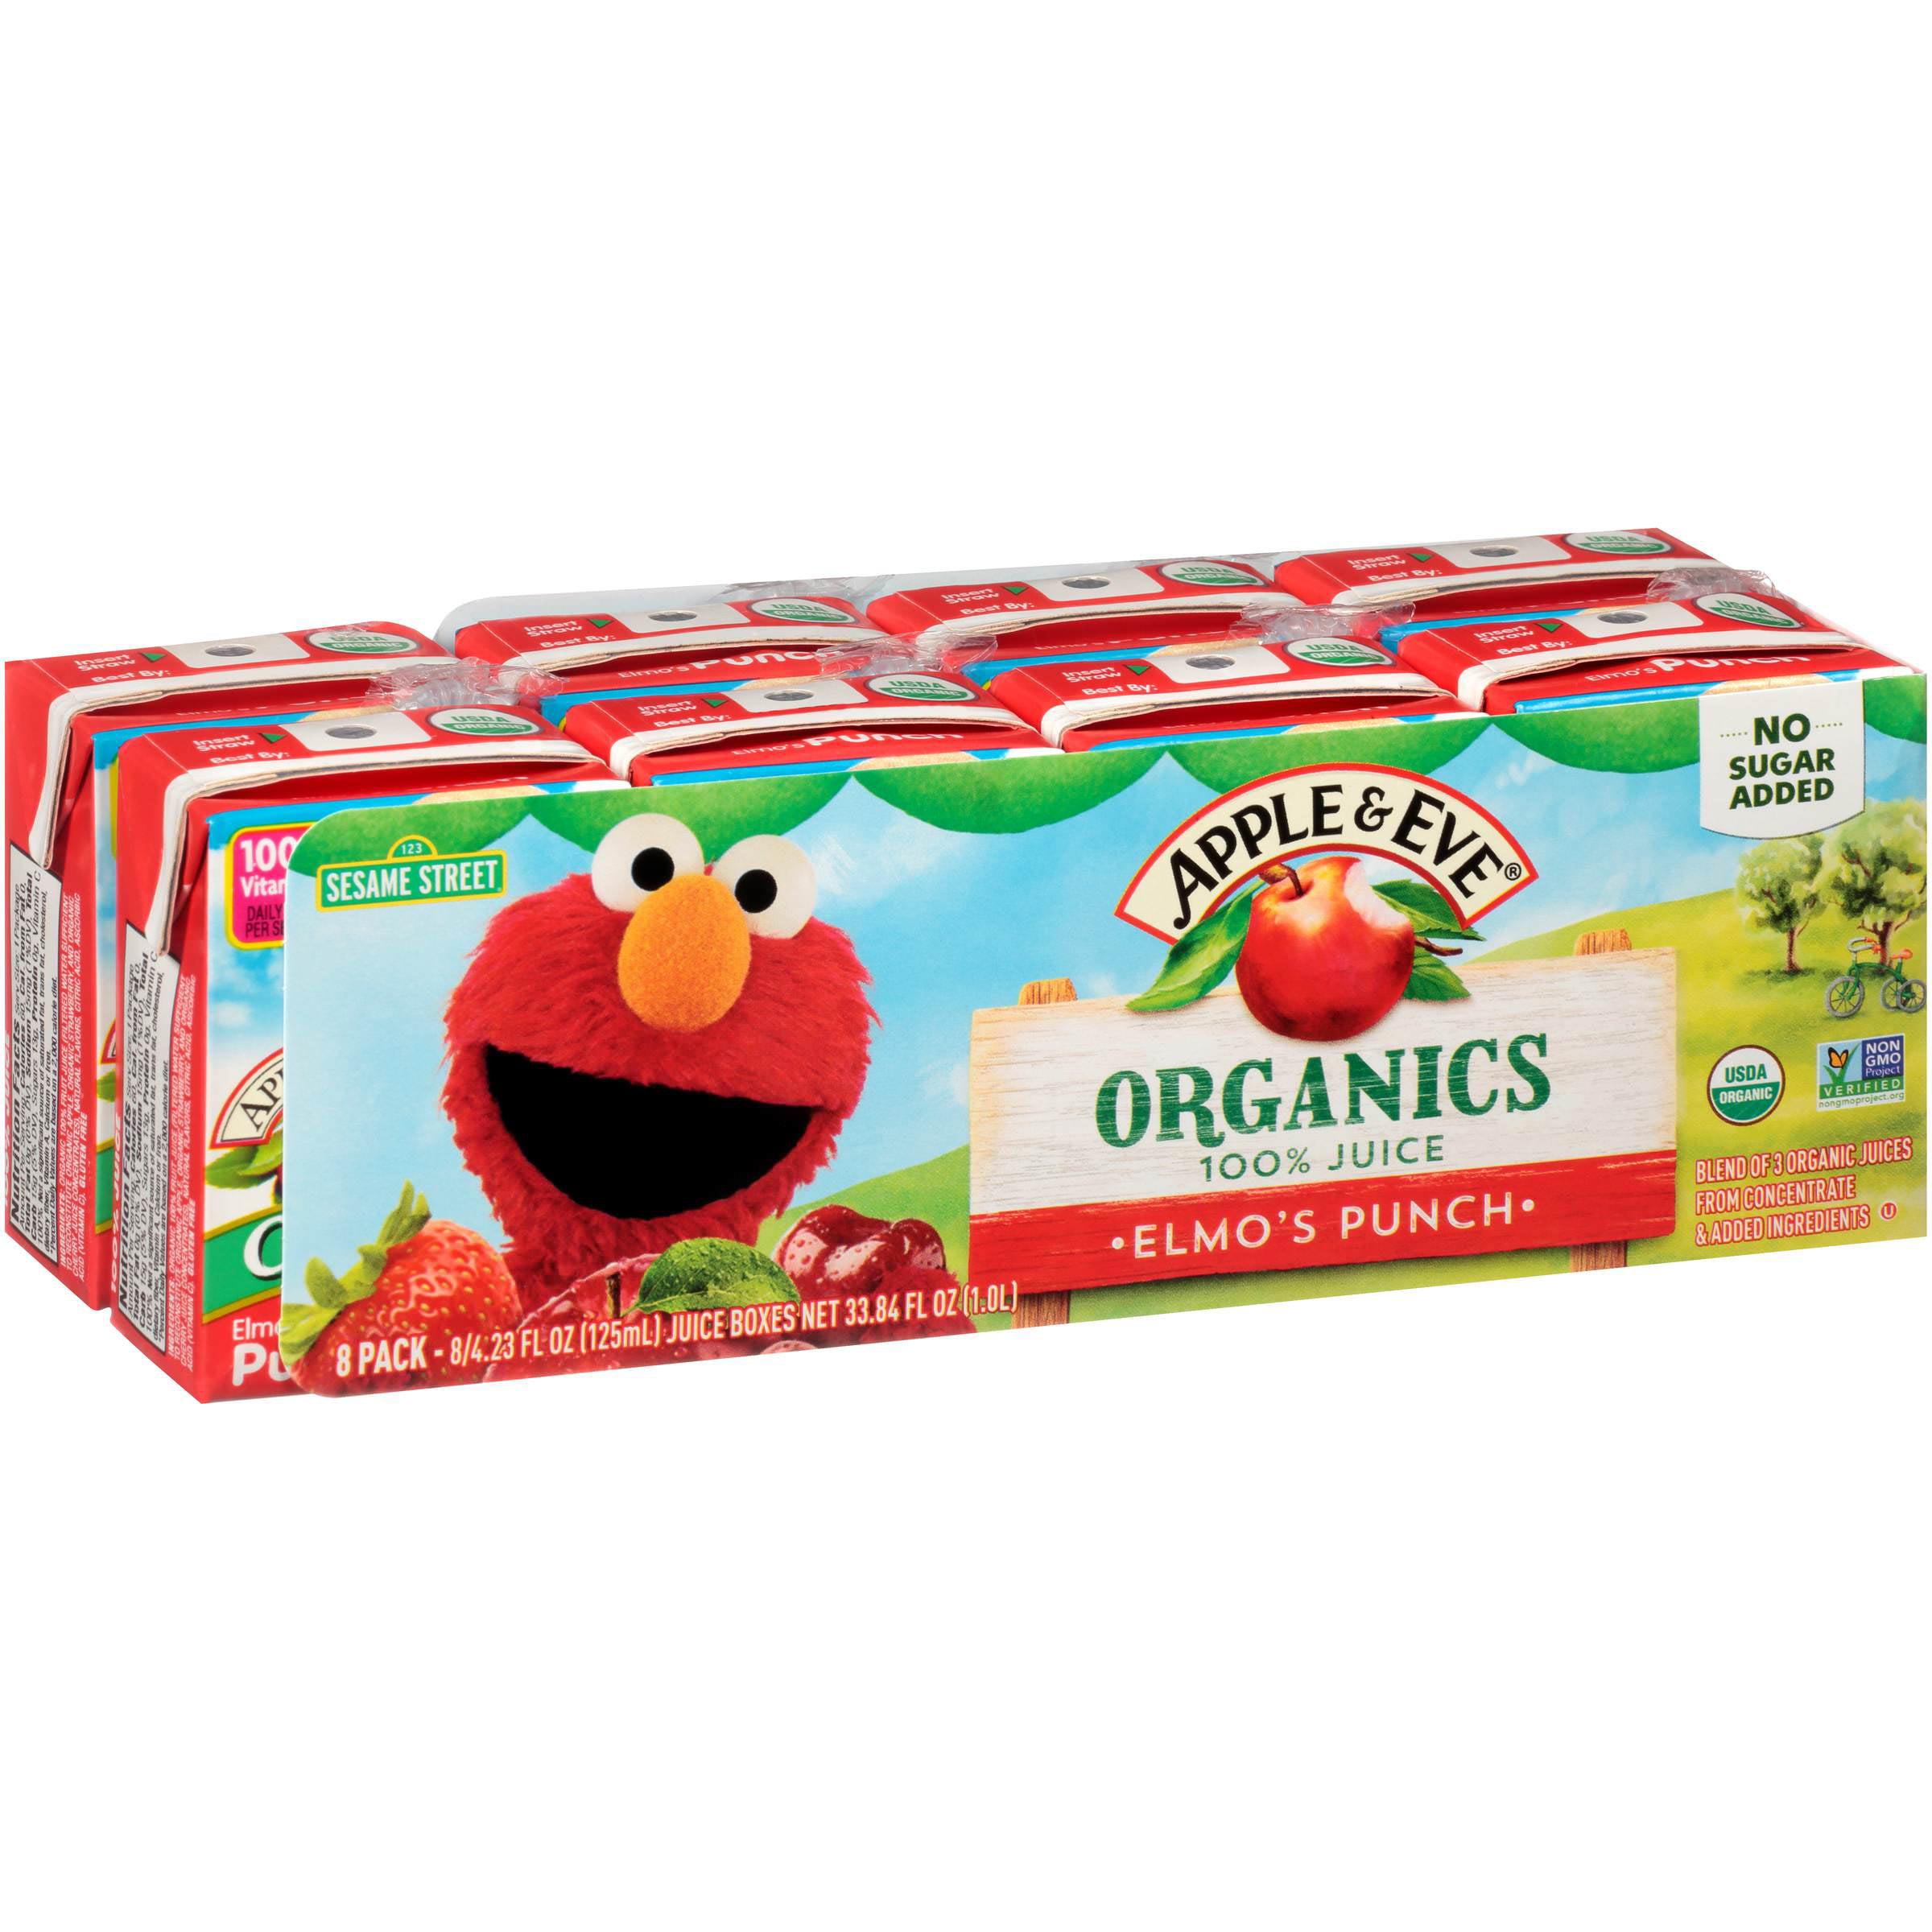 (40 Boxes) Apple & Eve Sesame Street Organics, Elmo's Punch, 6 75 fl oz